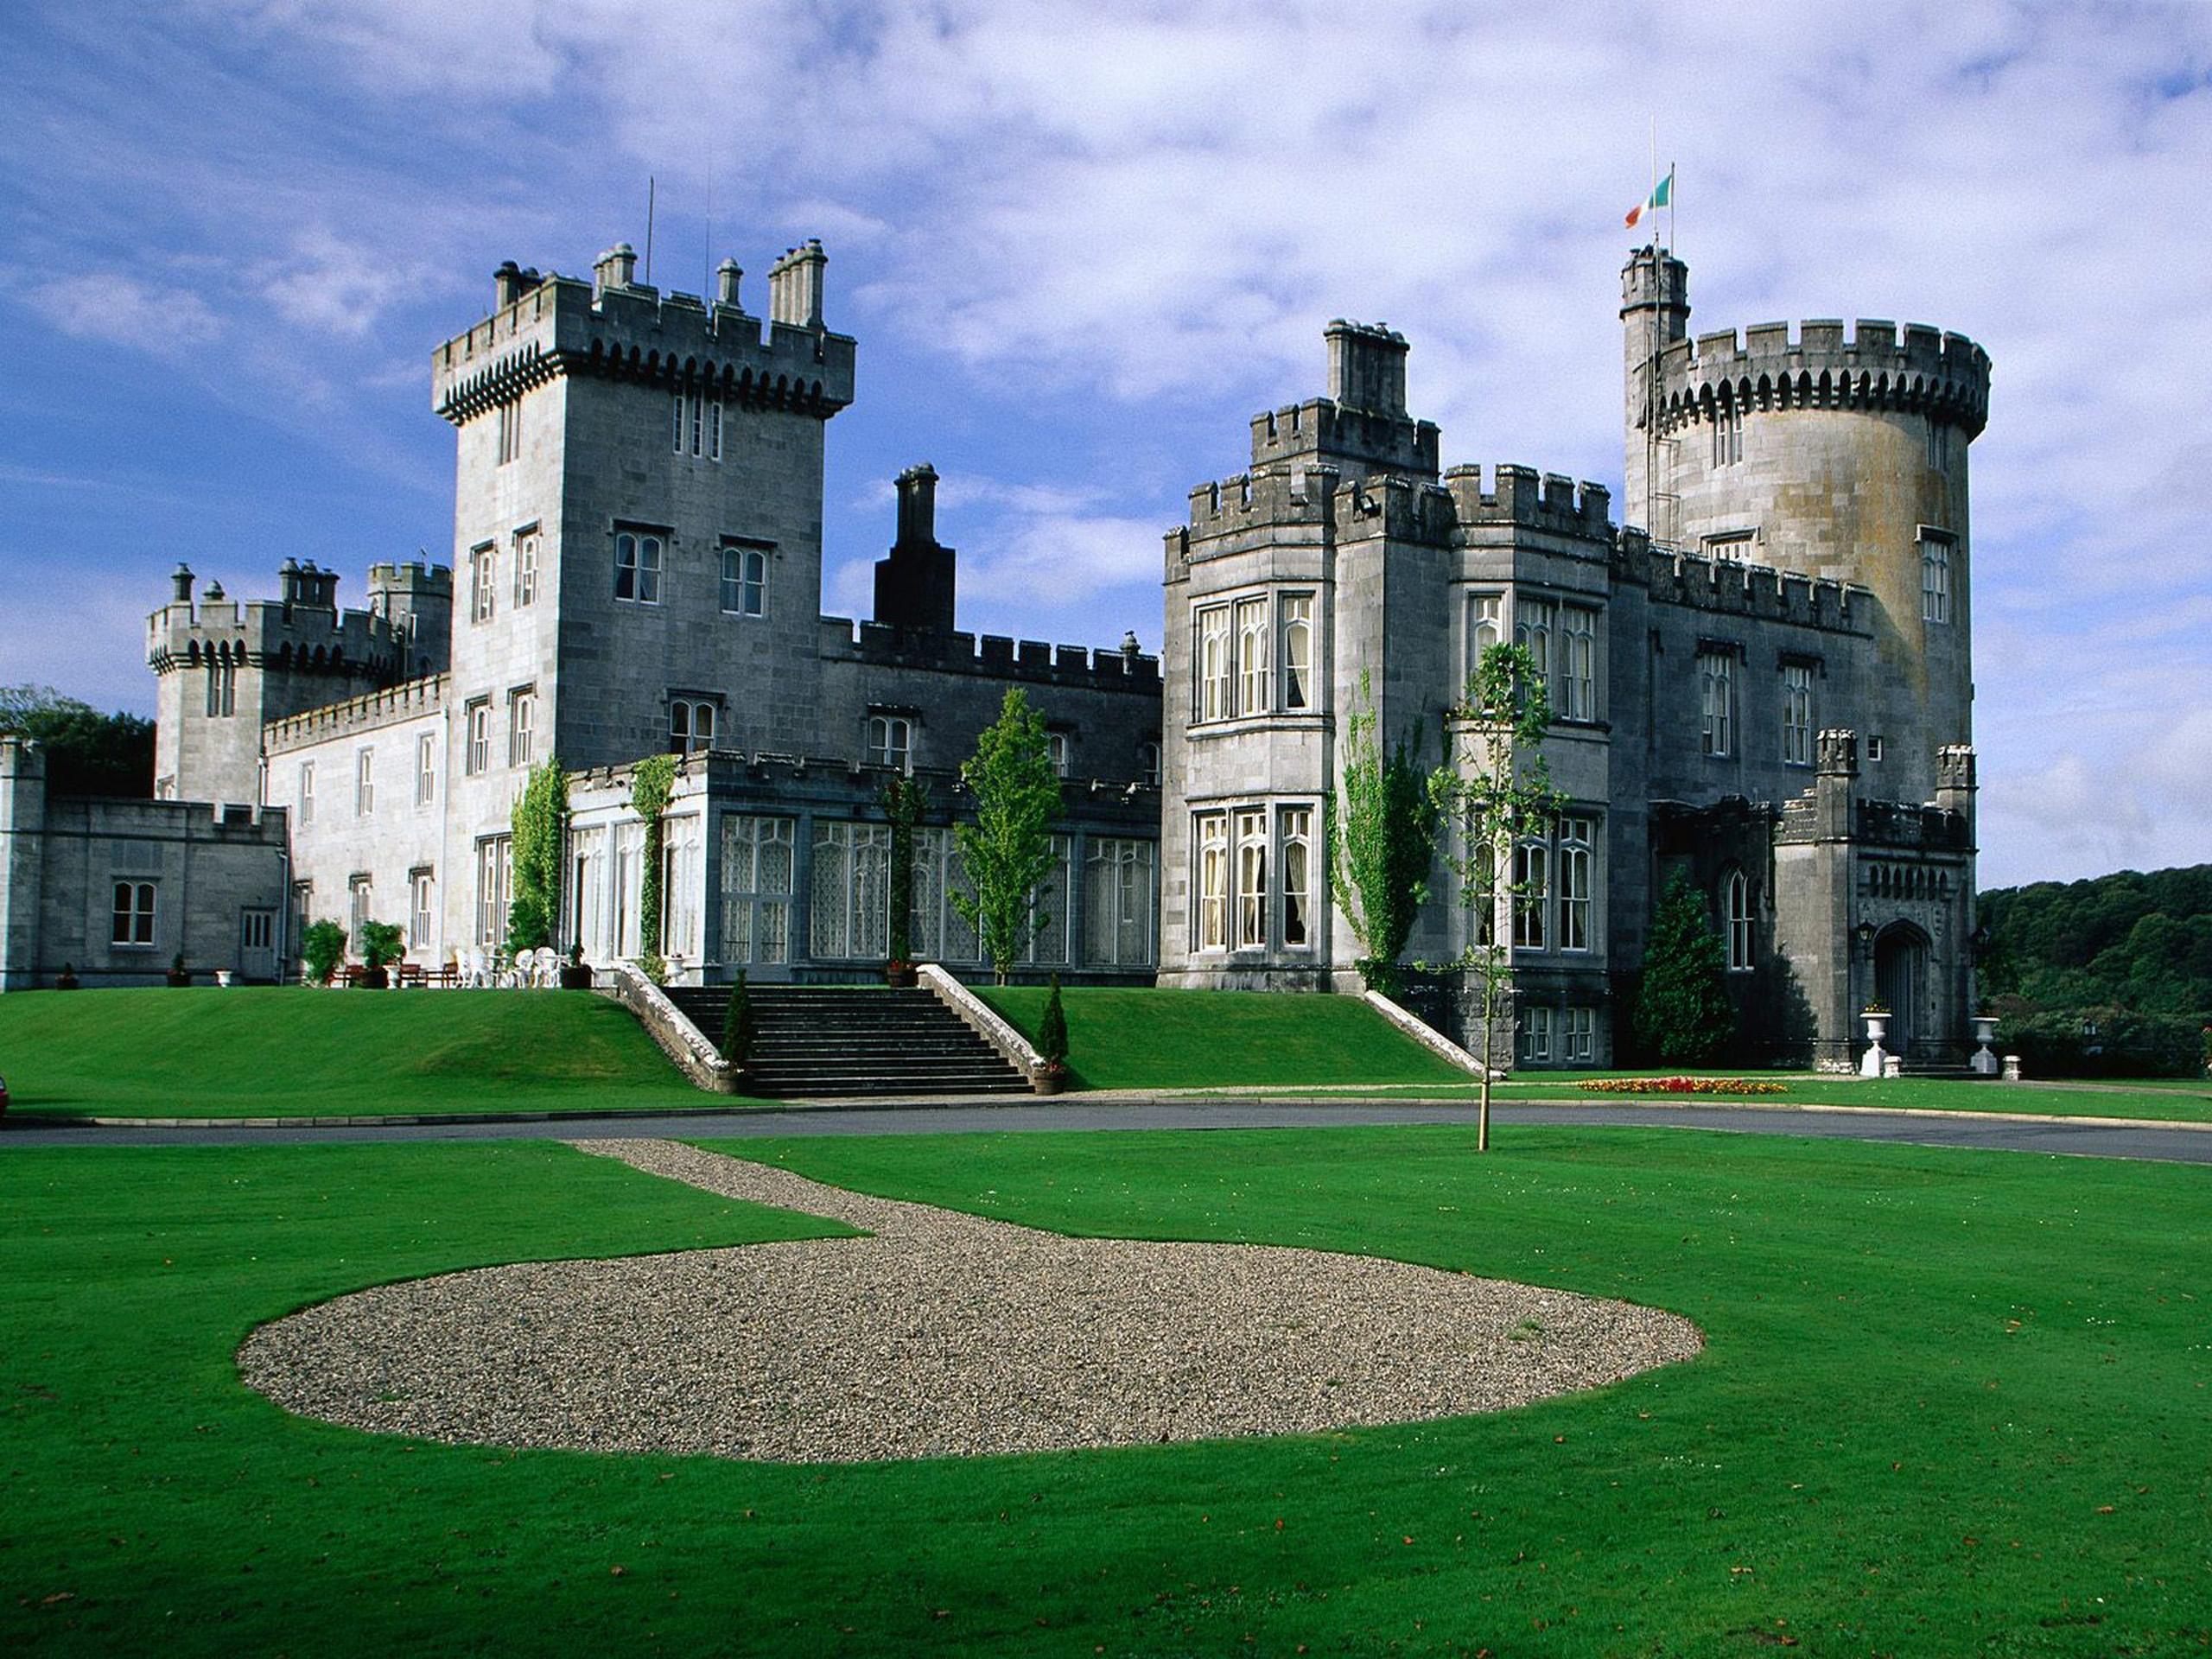 Castles Wallpapers 2560x1920